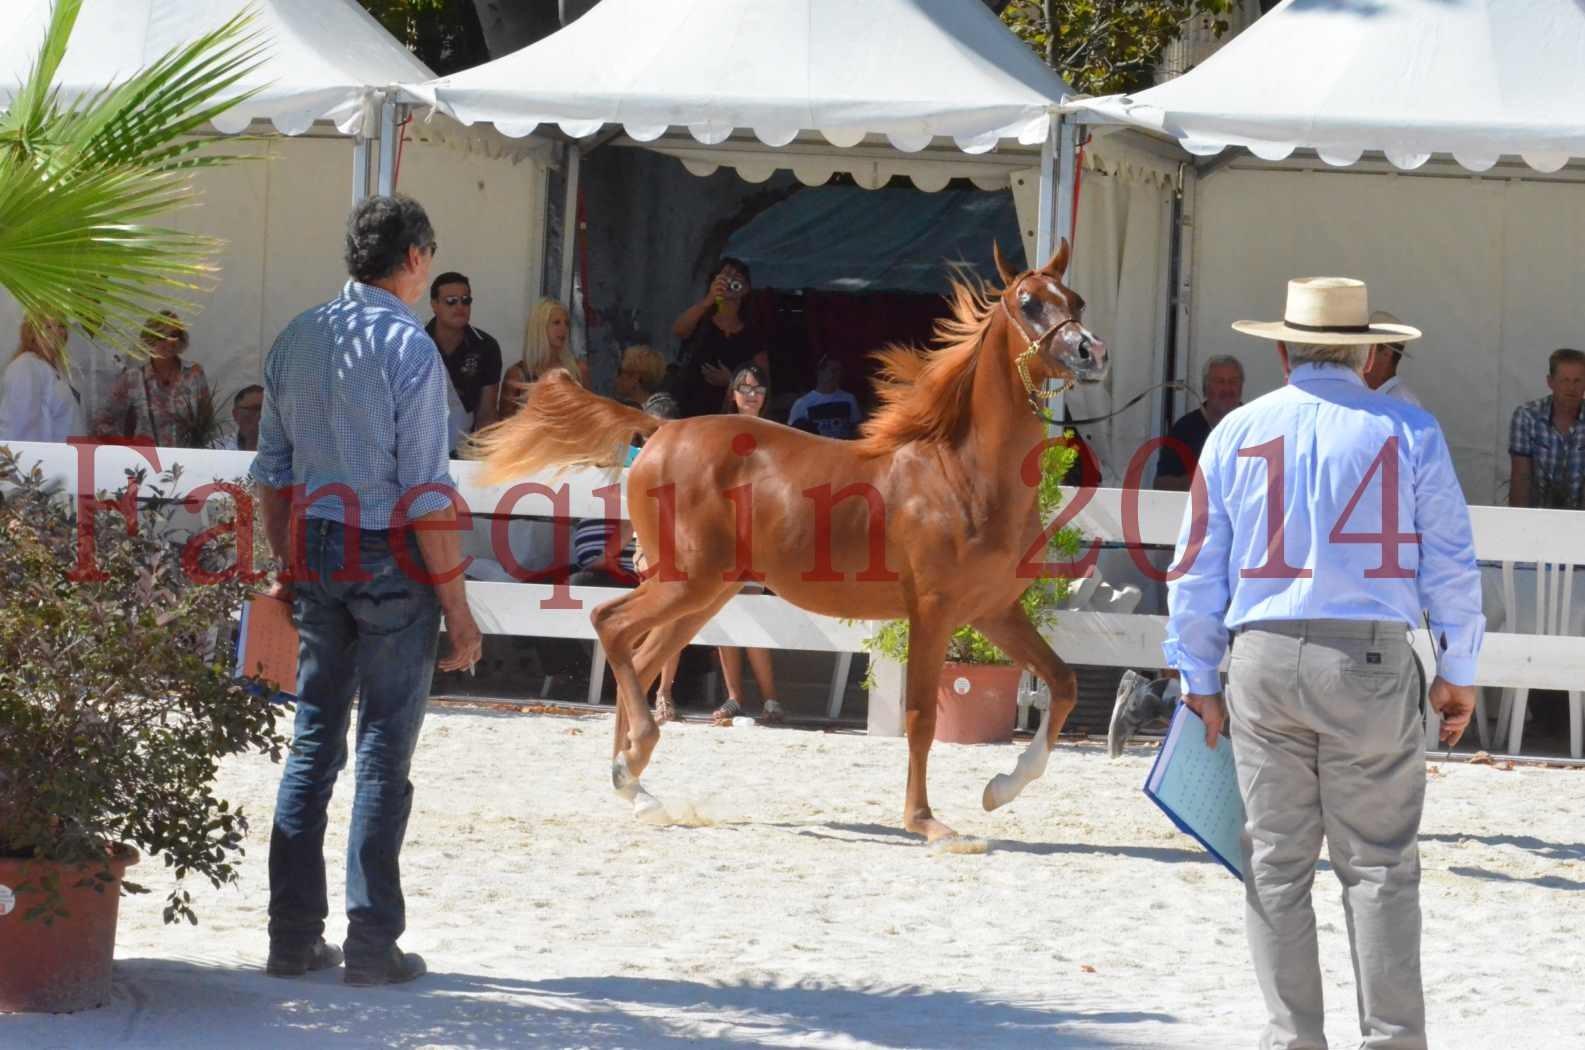 Concours National de Nîmes de chevaux ARABES 2014 - TSAR NERIO - 20